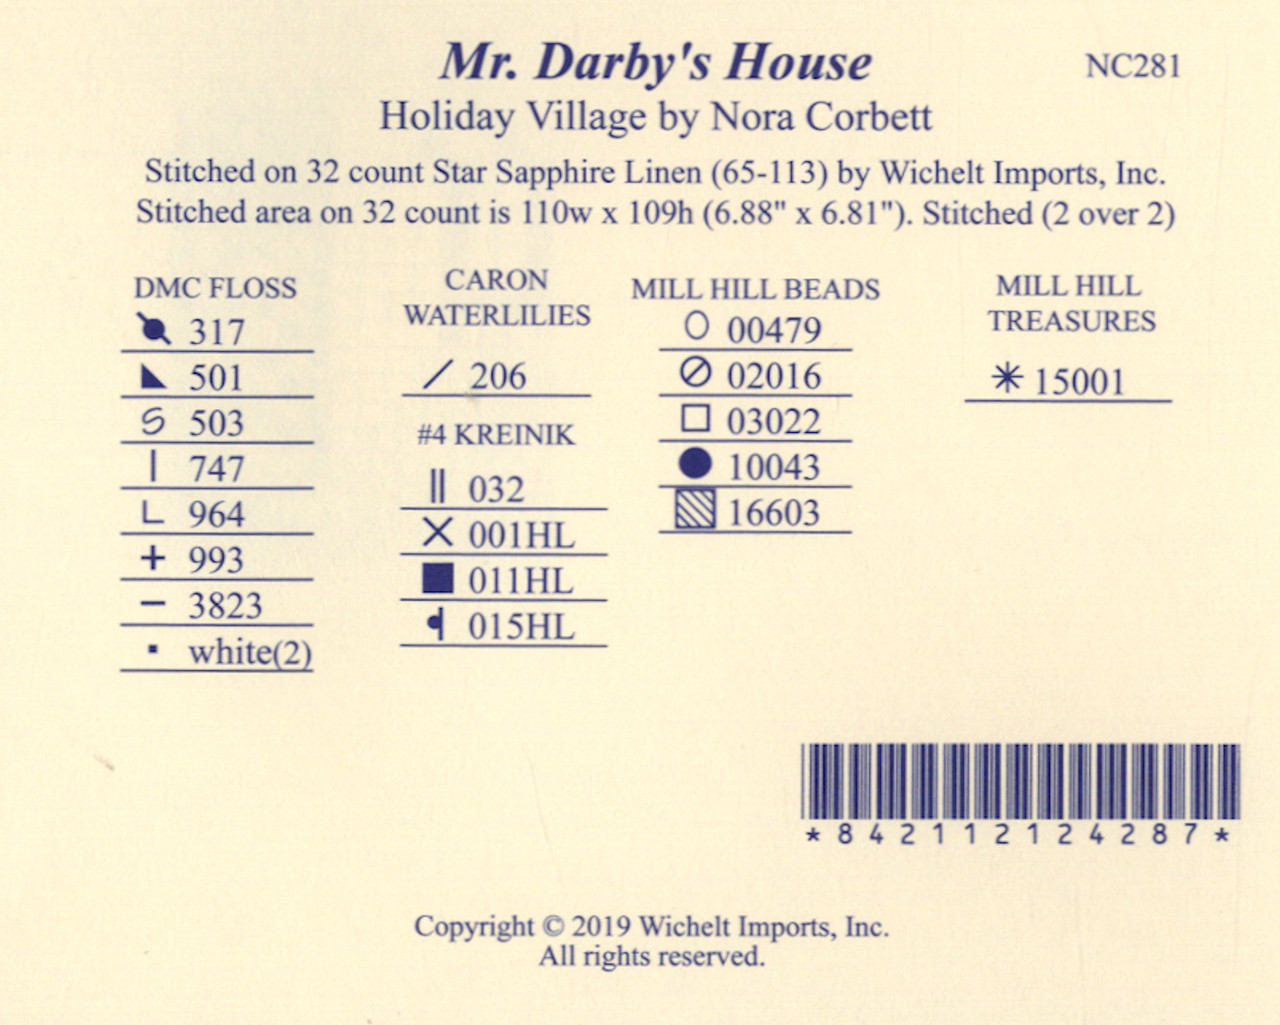 Nora Corbett - Mr. Darby's House